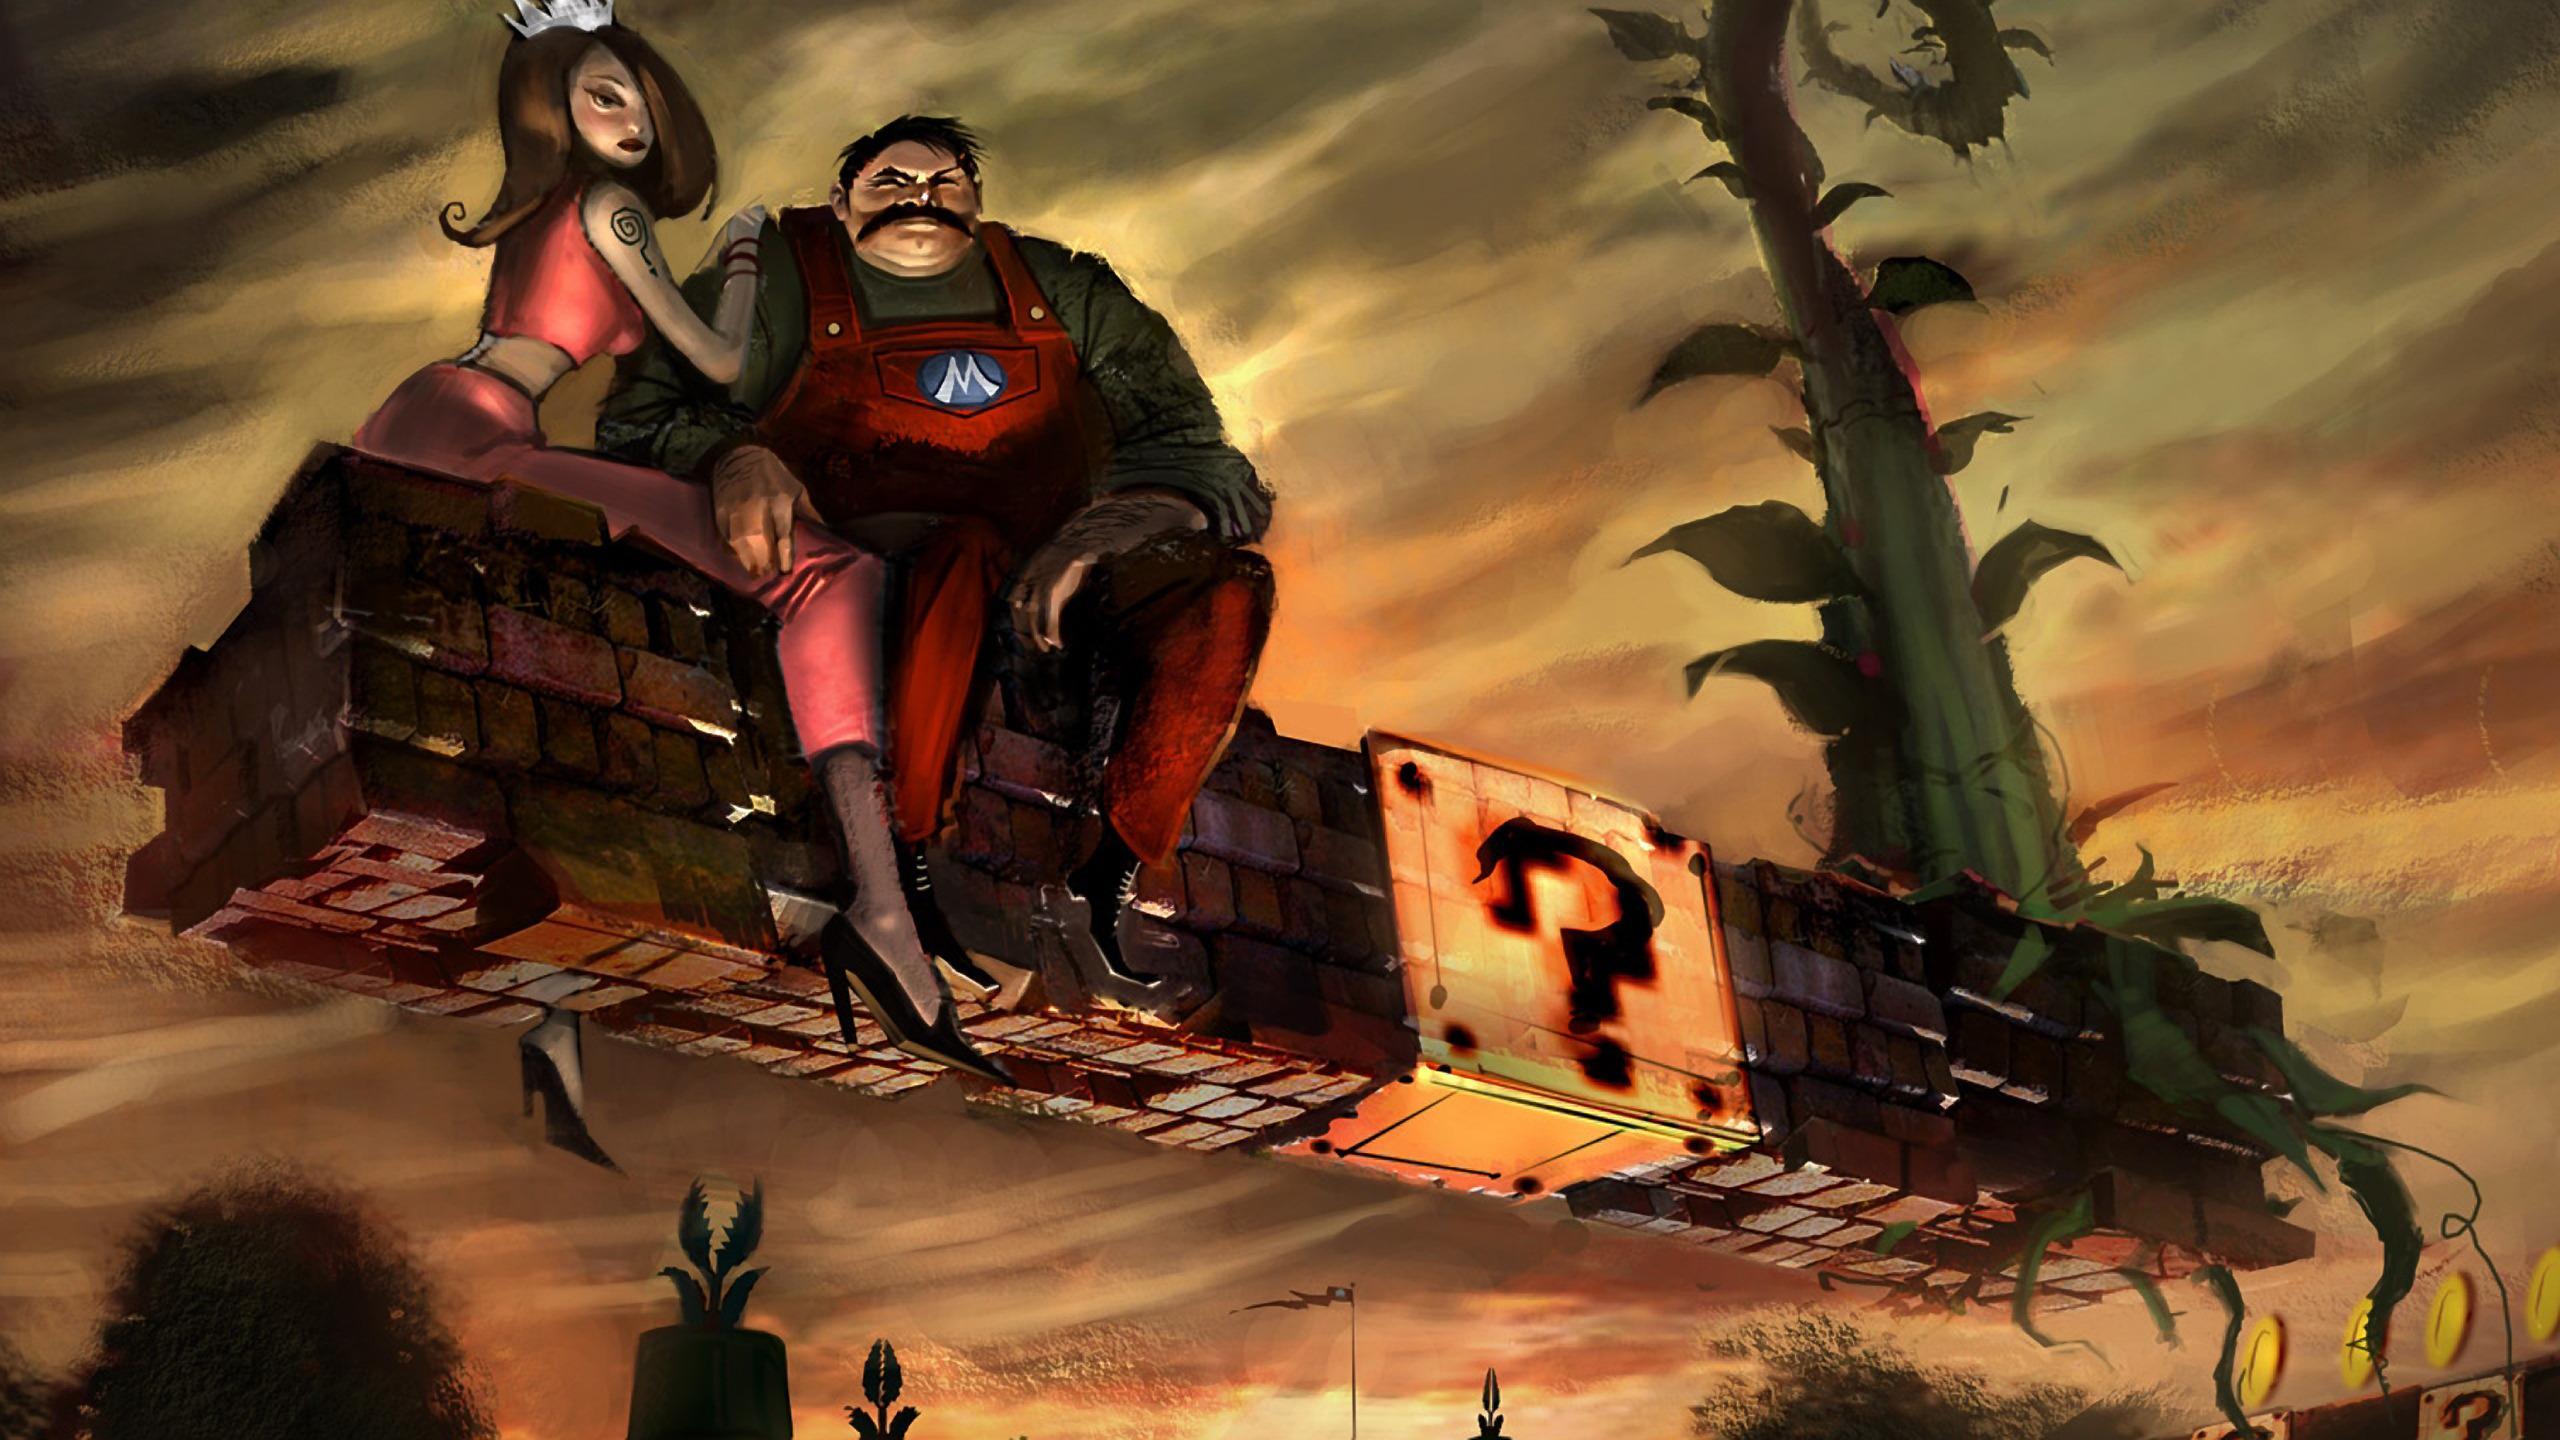 Image: Mario, Princess, mustache, bricks, hanging, plant, sky, art, play, sign, question